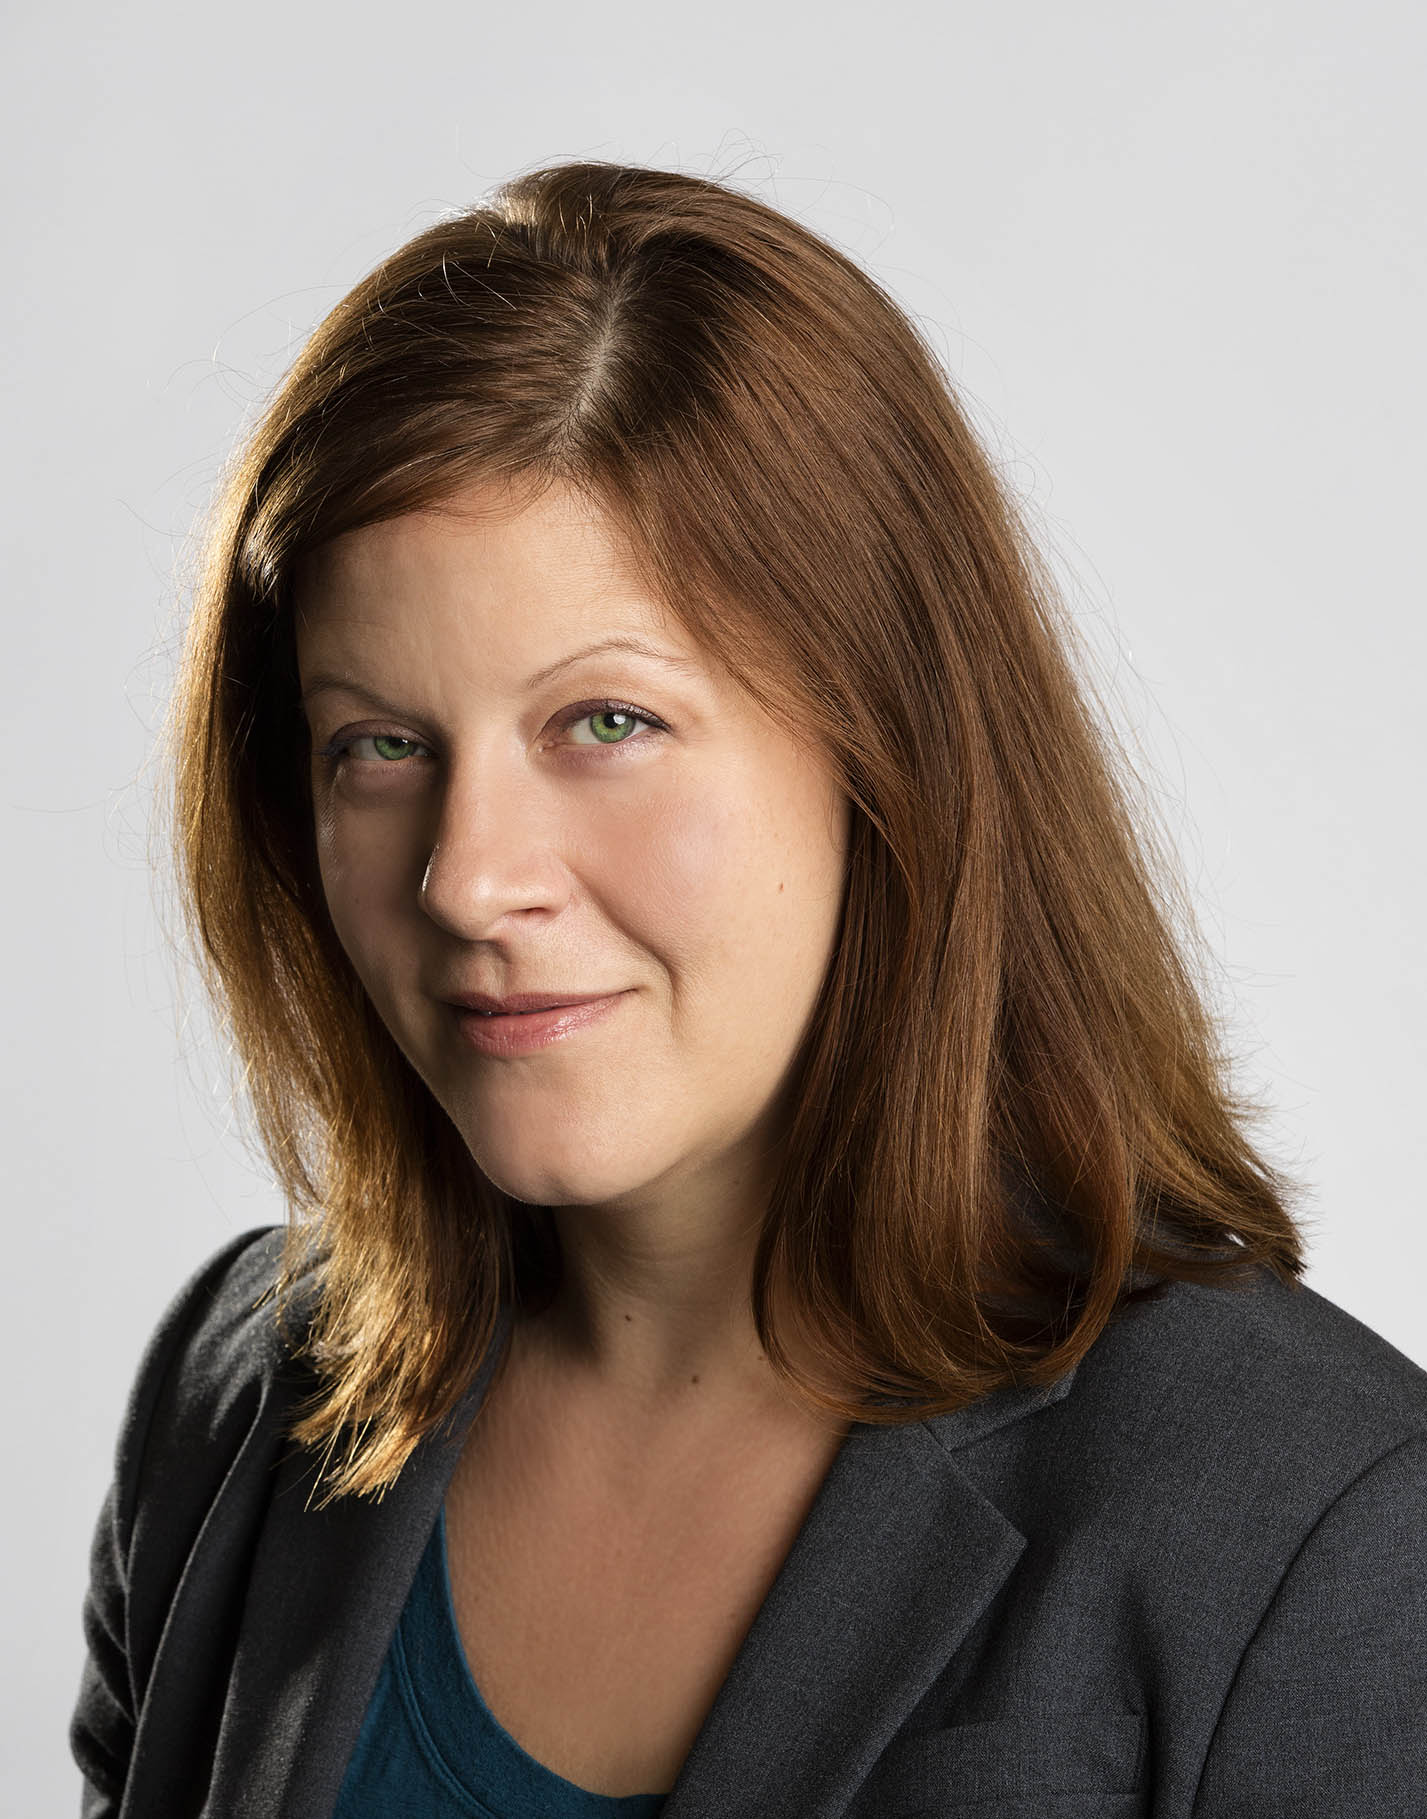 Angela Dietsch